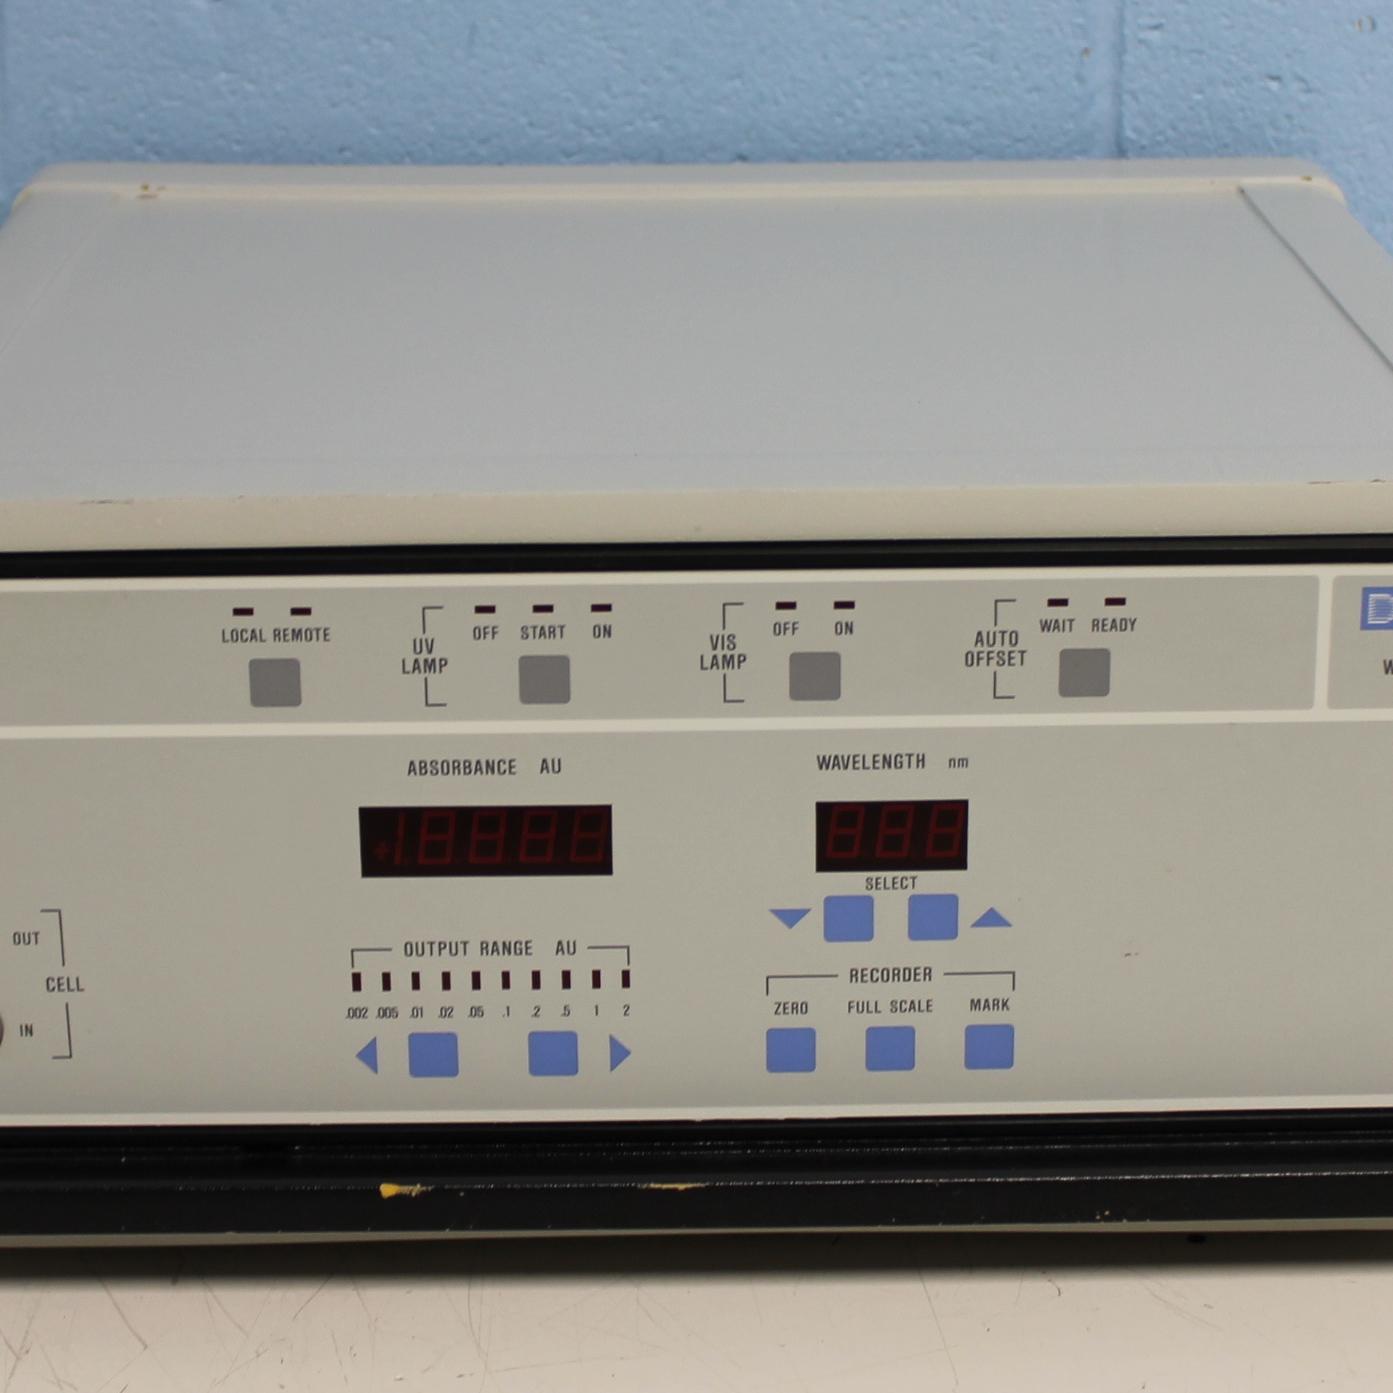 Dionex VDM-2 Variable Wavelength Detector Image